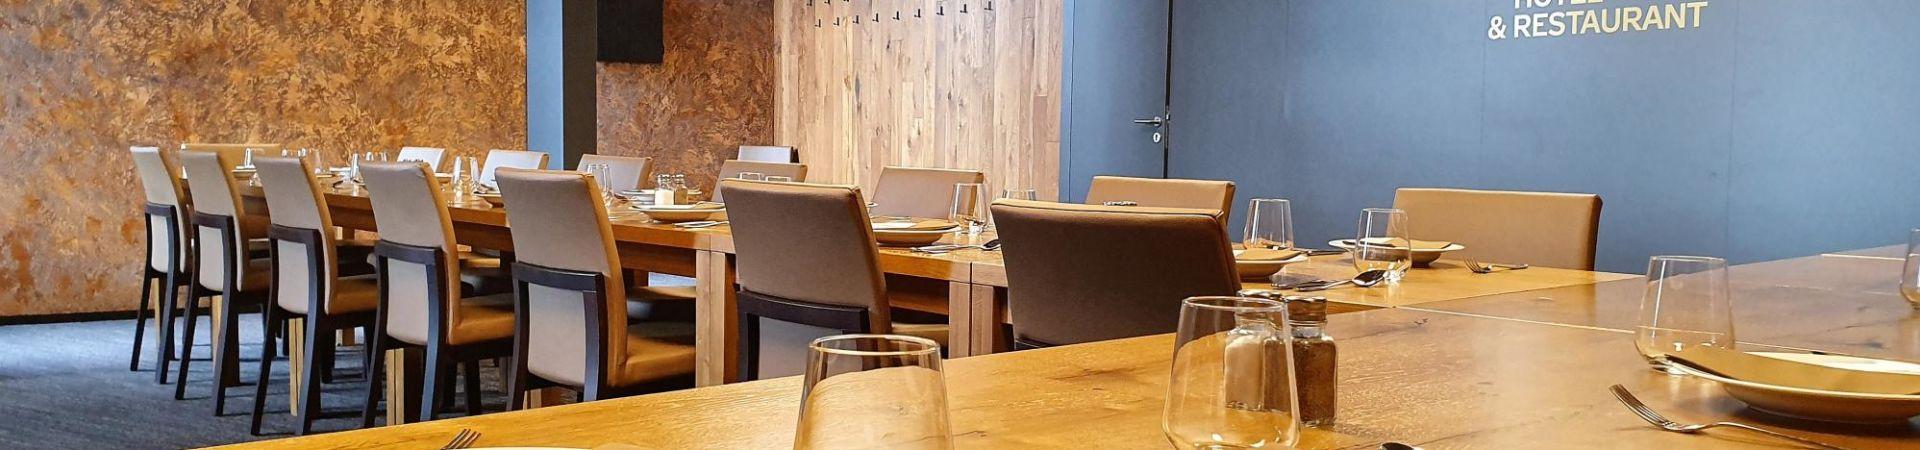 D1 Hotel & Restaurant - Sál R